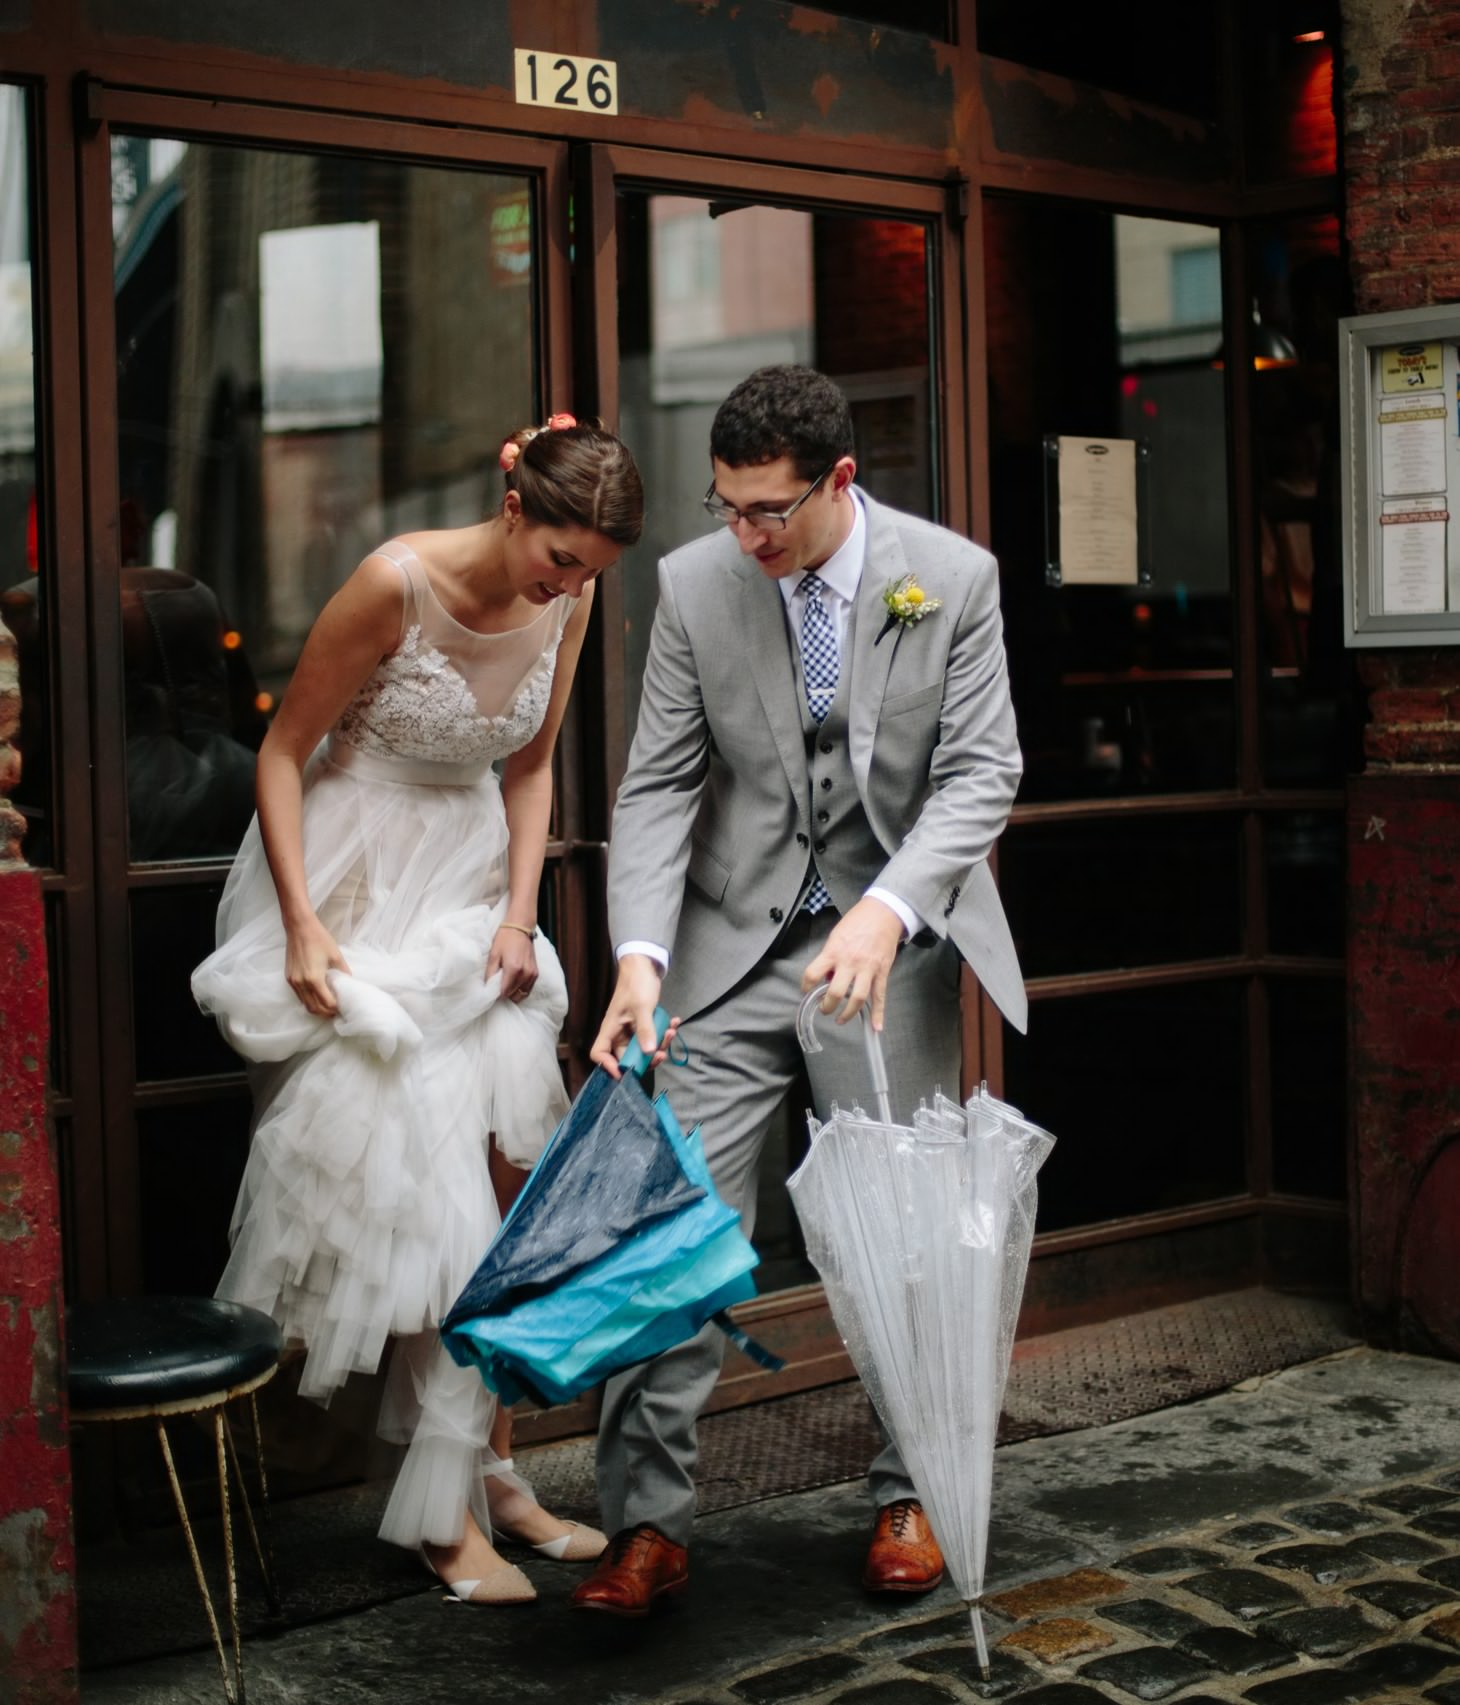 009-nyc-dumbo-loft-brooklyn-wedding-photographer-smitten-chickens-photo-.jpg